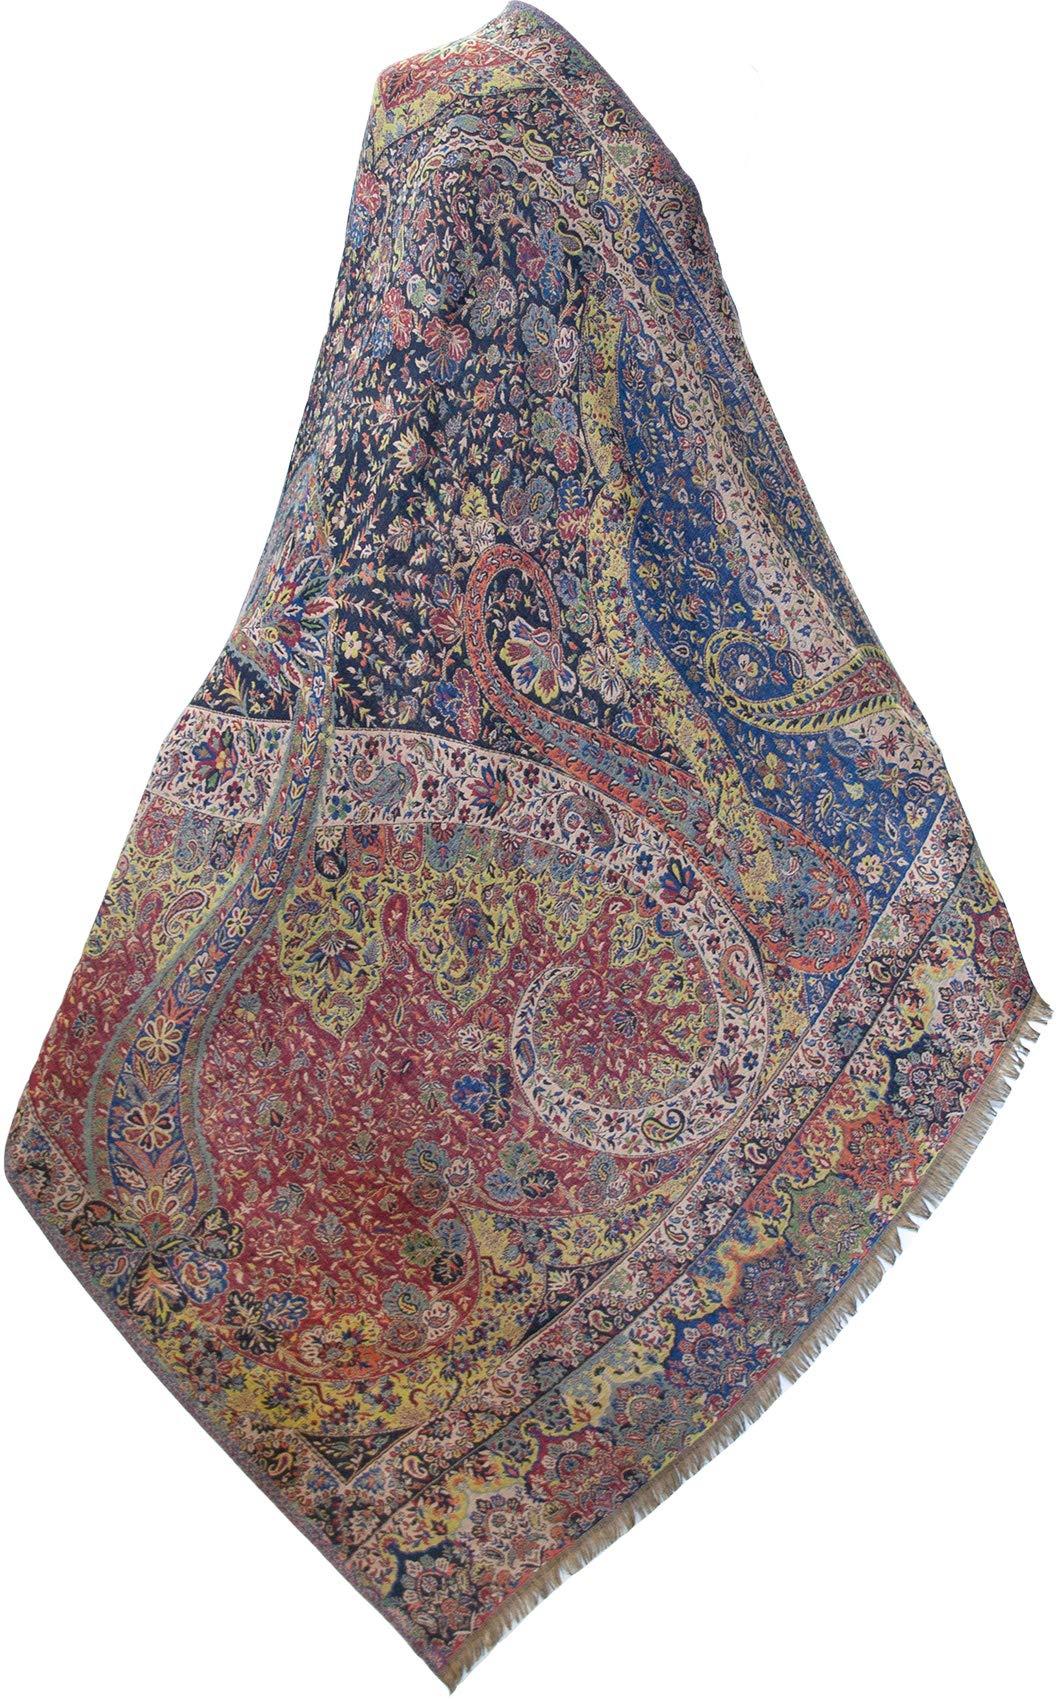 Large, Superior Kani Shawl. Paisley Jamawar from India. Warm & Very Detailed